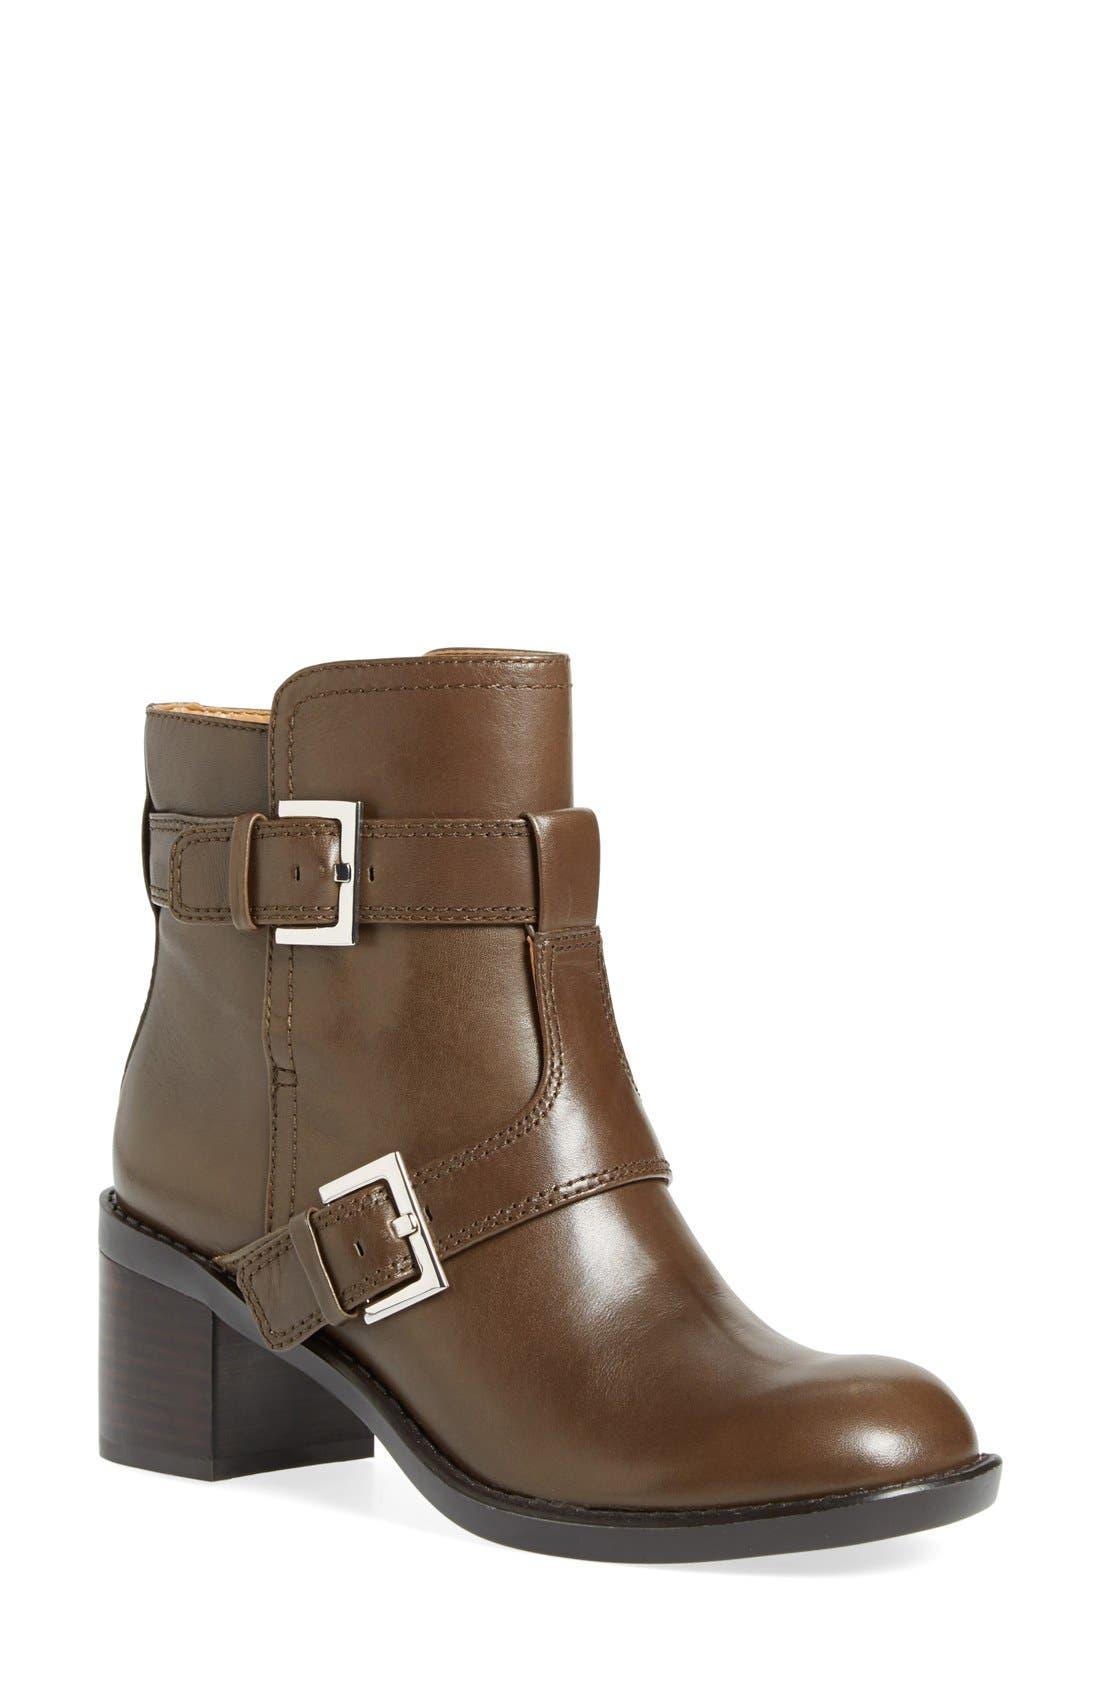 Alternate Image 1 Selected - Nine West 'Lorena' Buckle Mid Boot (Women)